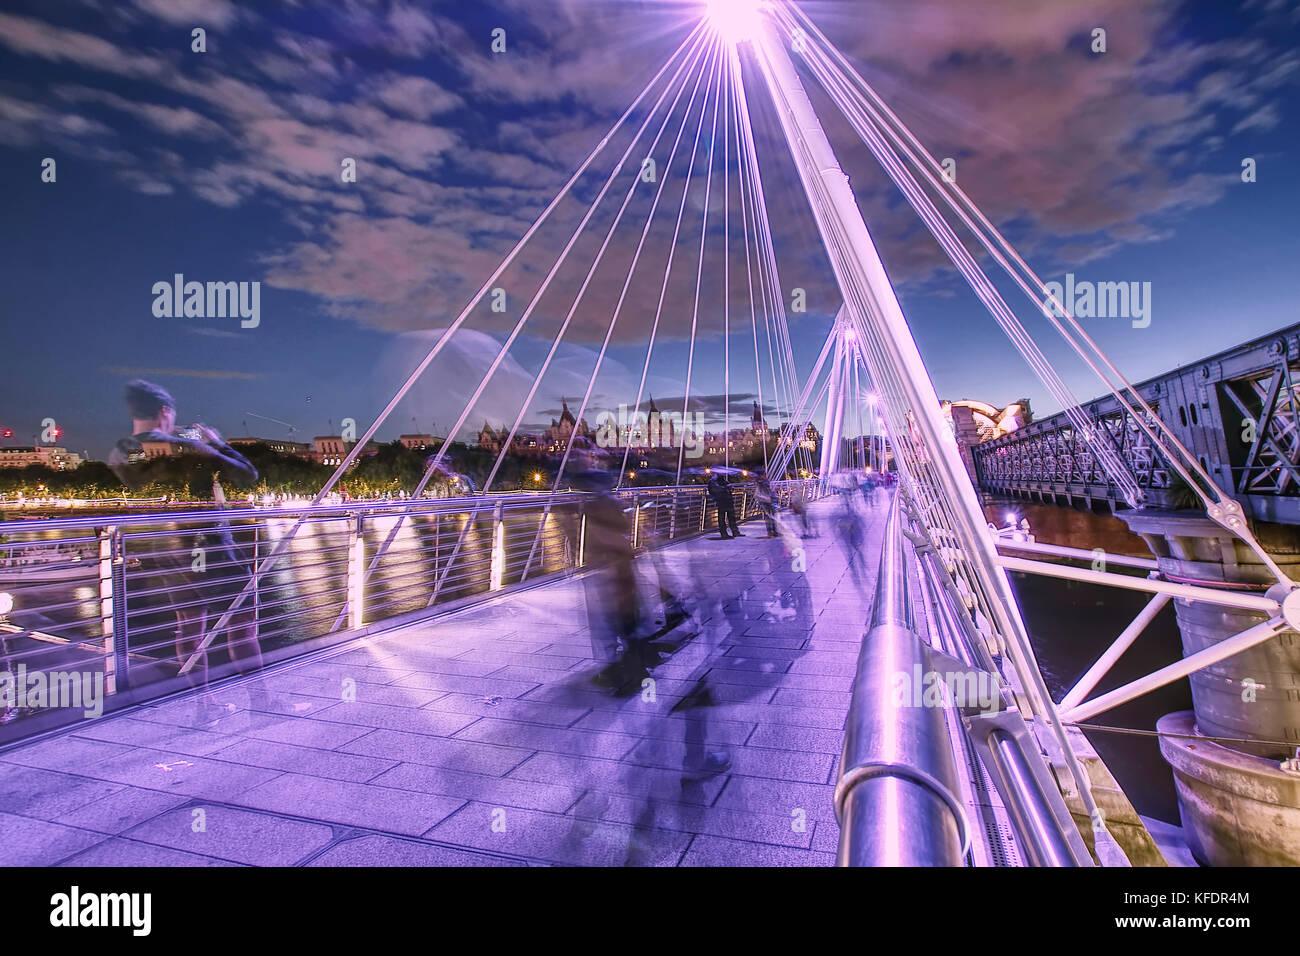 Ghosts on Jubilee Bridge at night,London,United Kingdom,summer 2017. Stock Photo